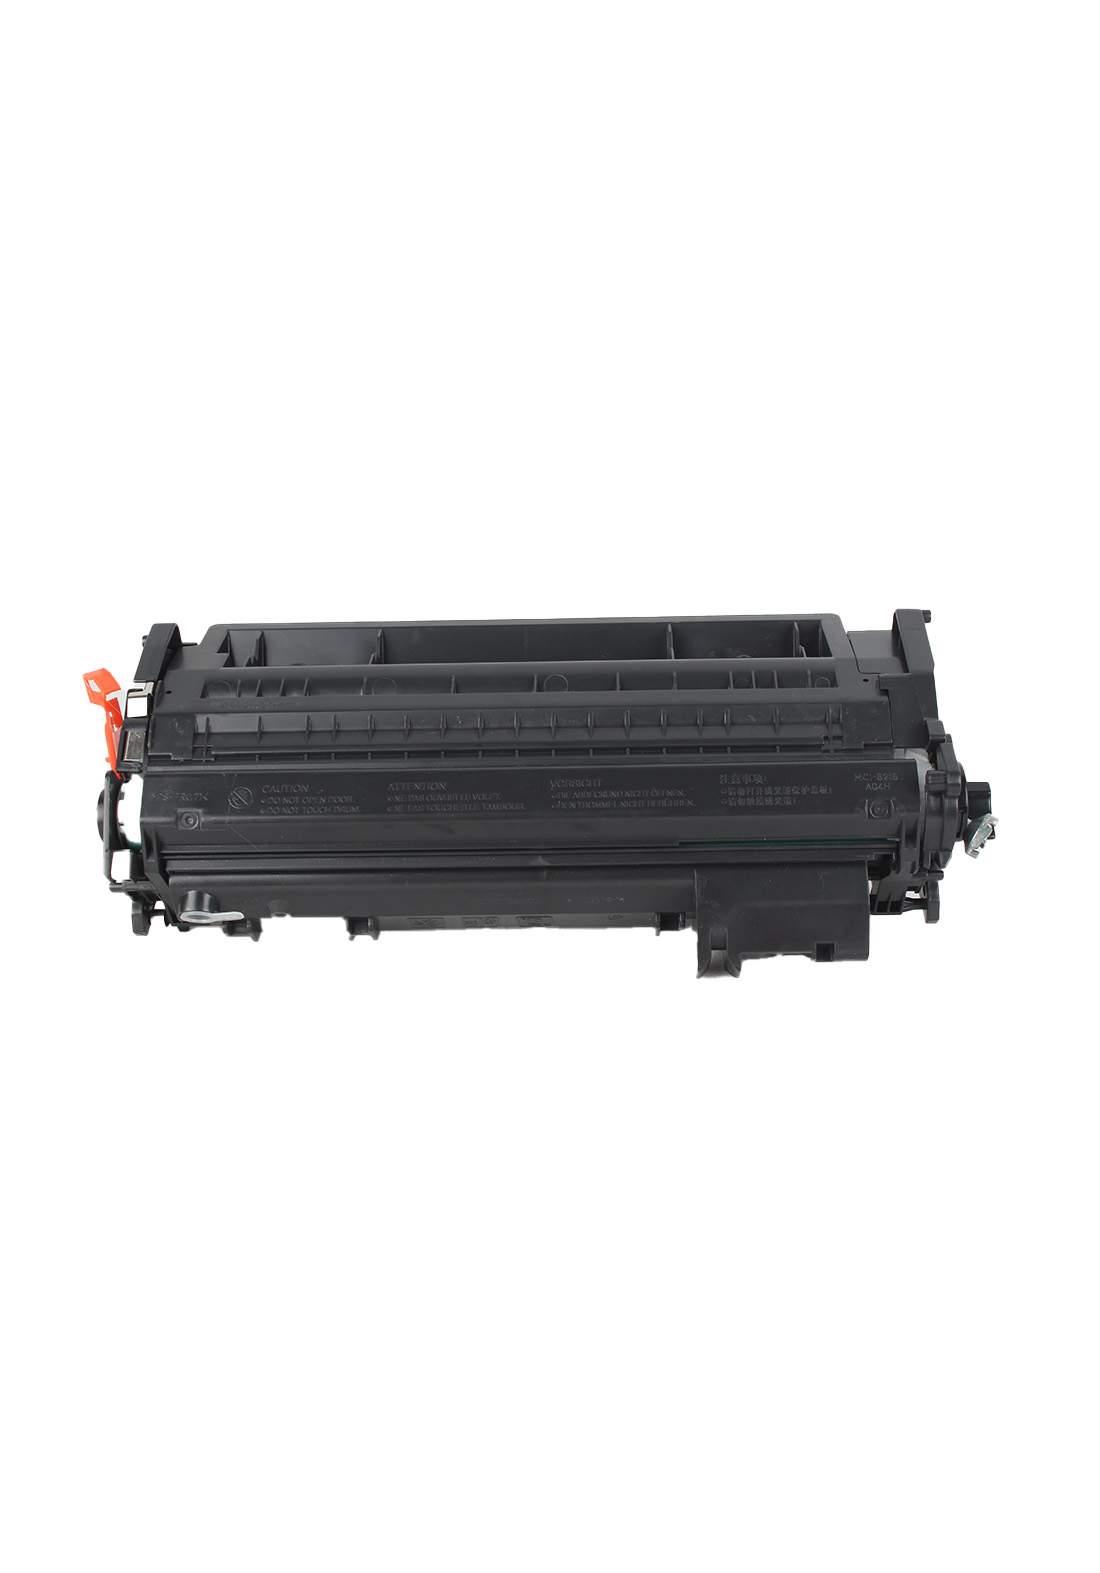 Super Power Plus 505A/280A/719 Laser Printer Toner Cartridge خرطوشة حبر